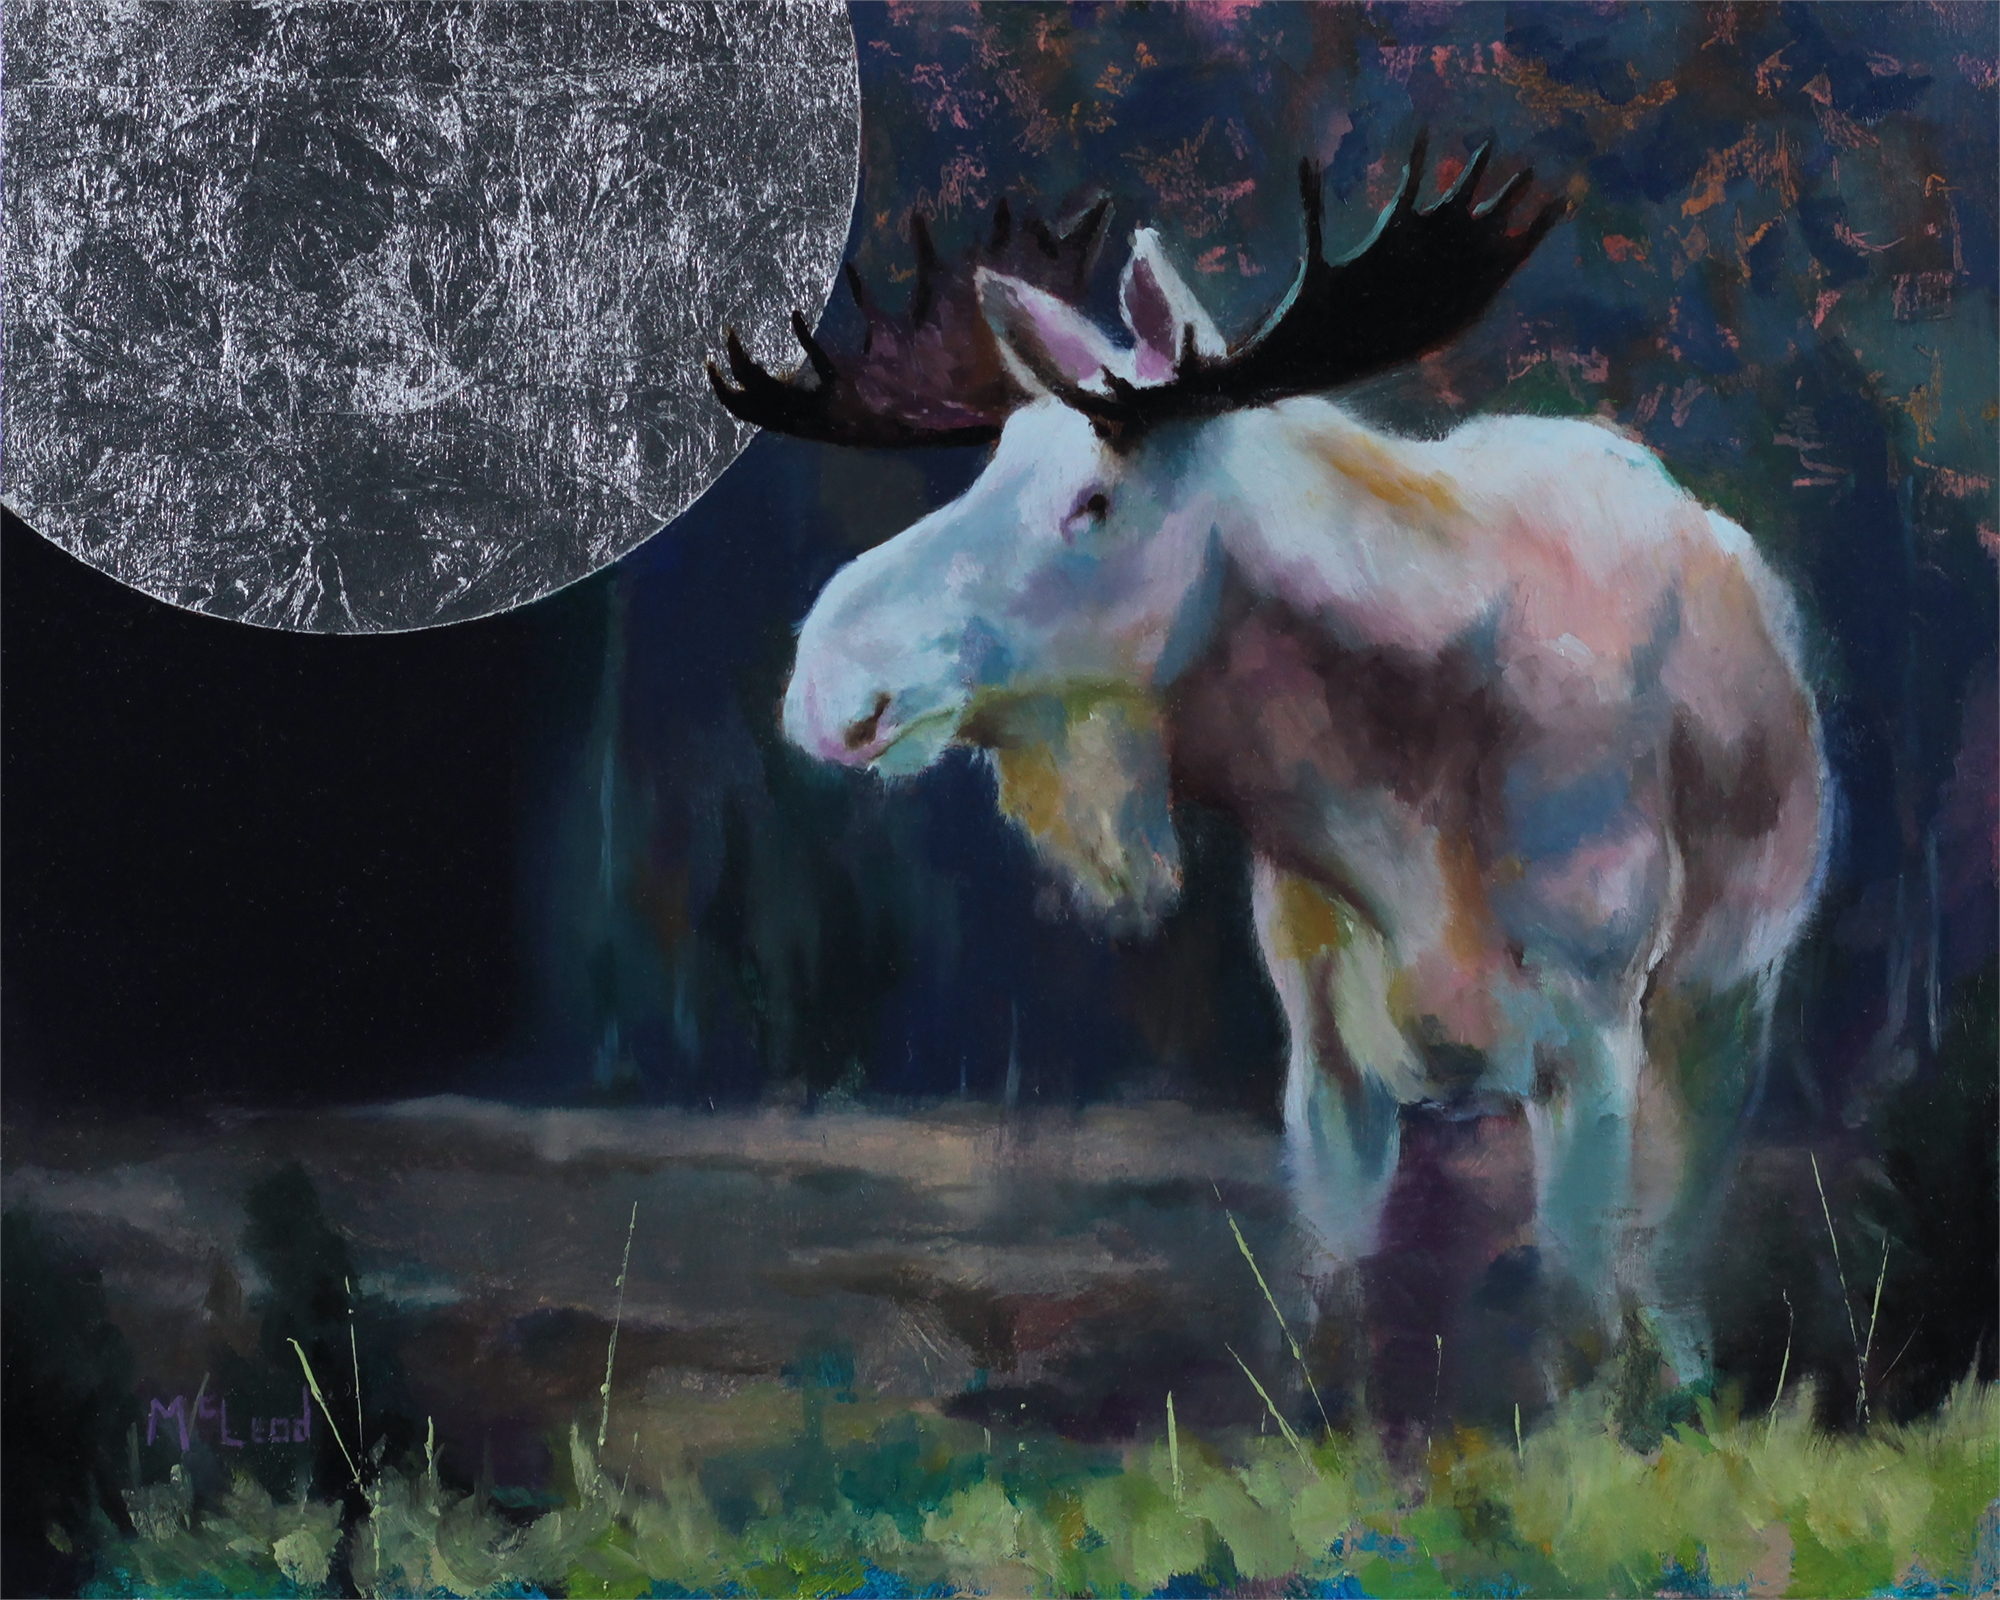 Remnant by John McLeod